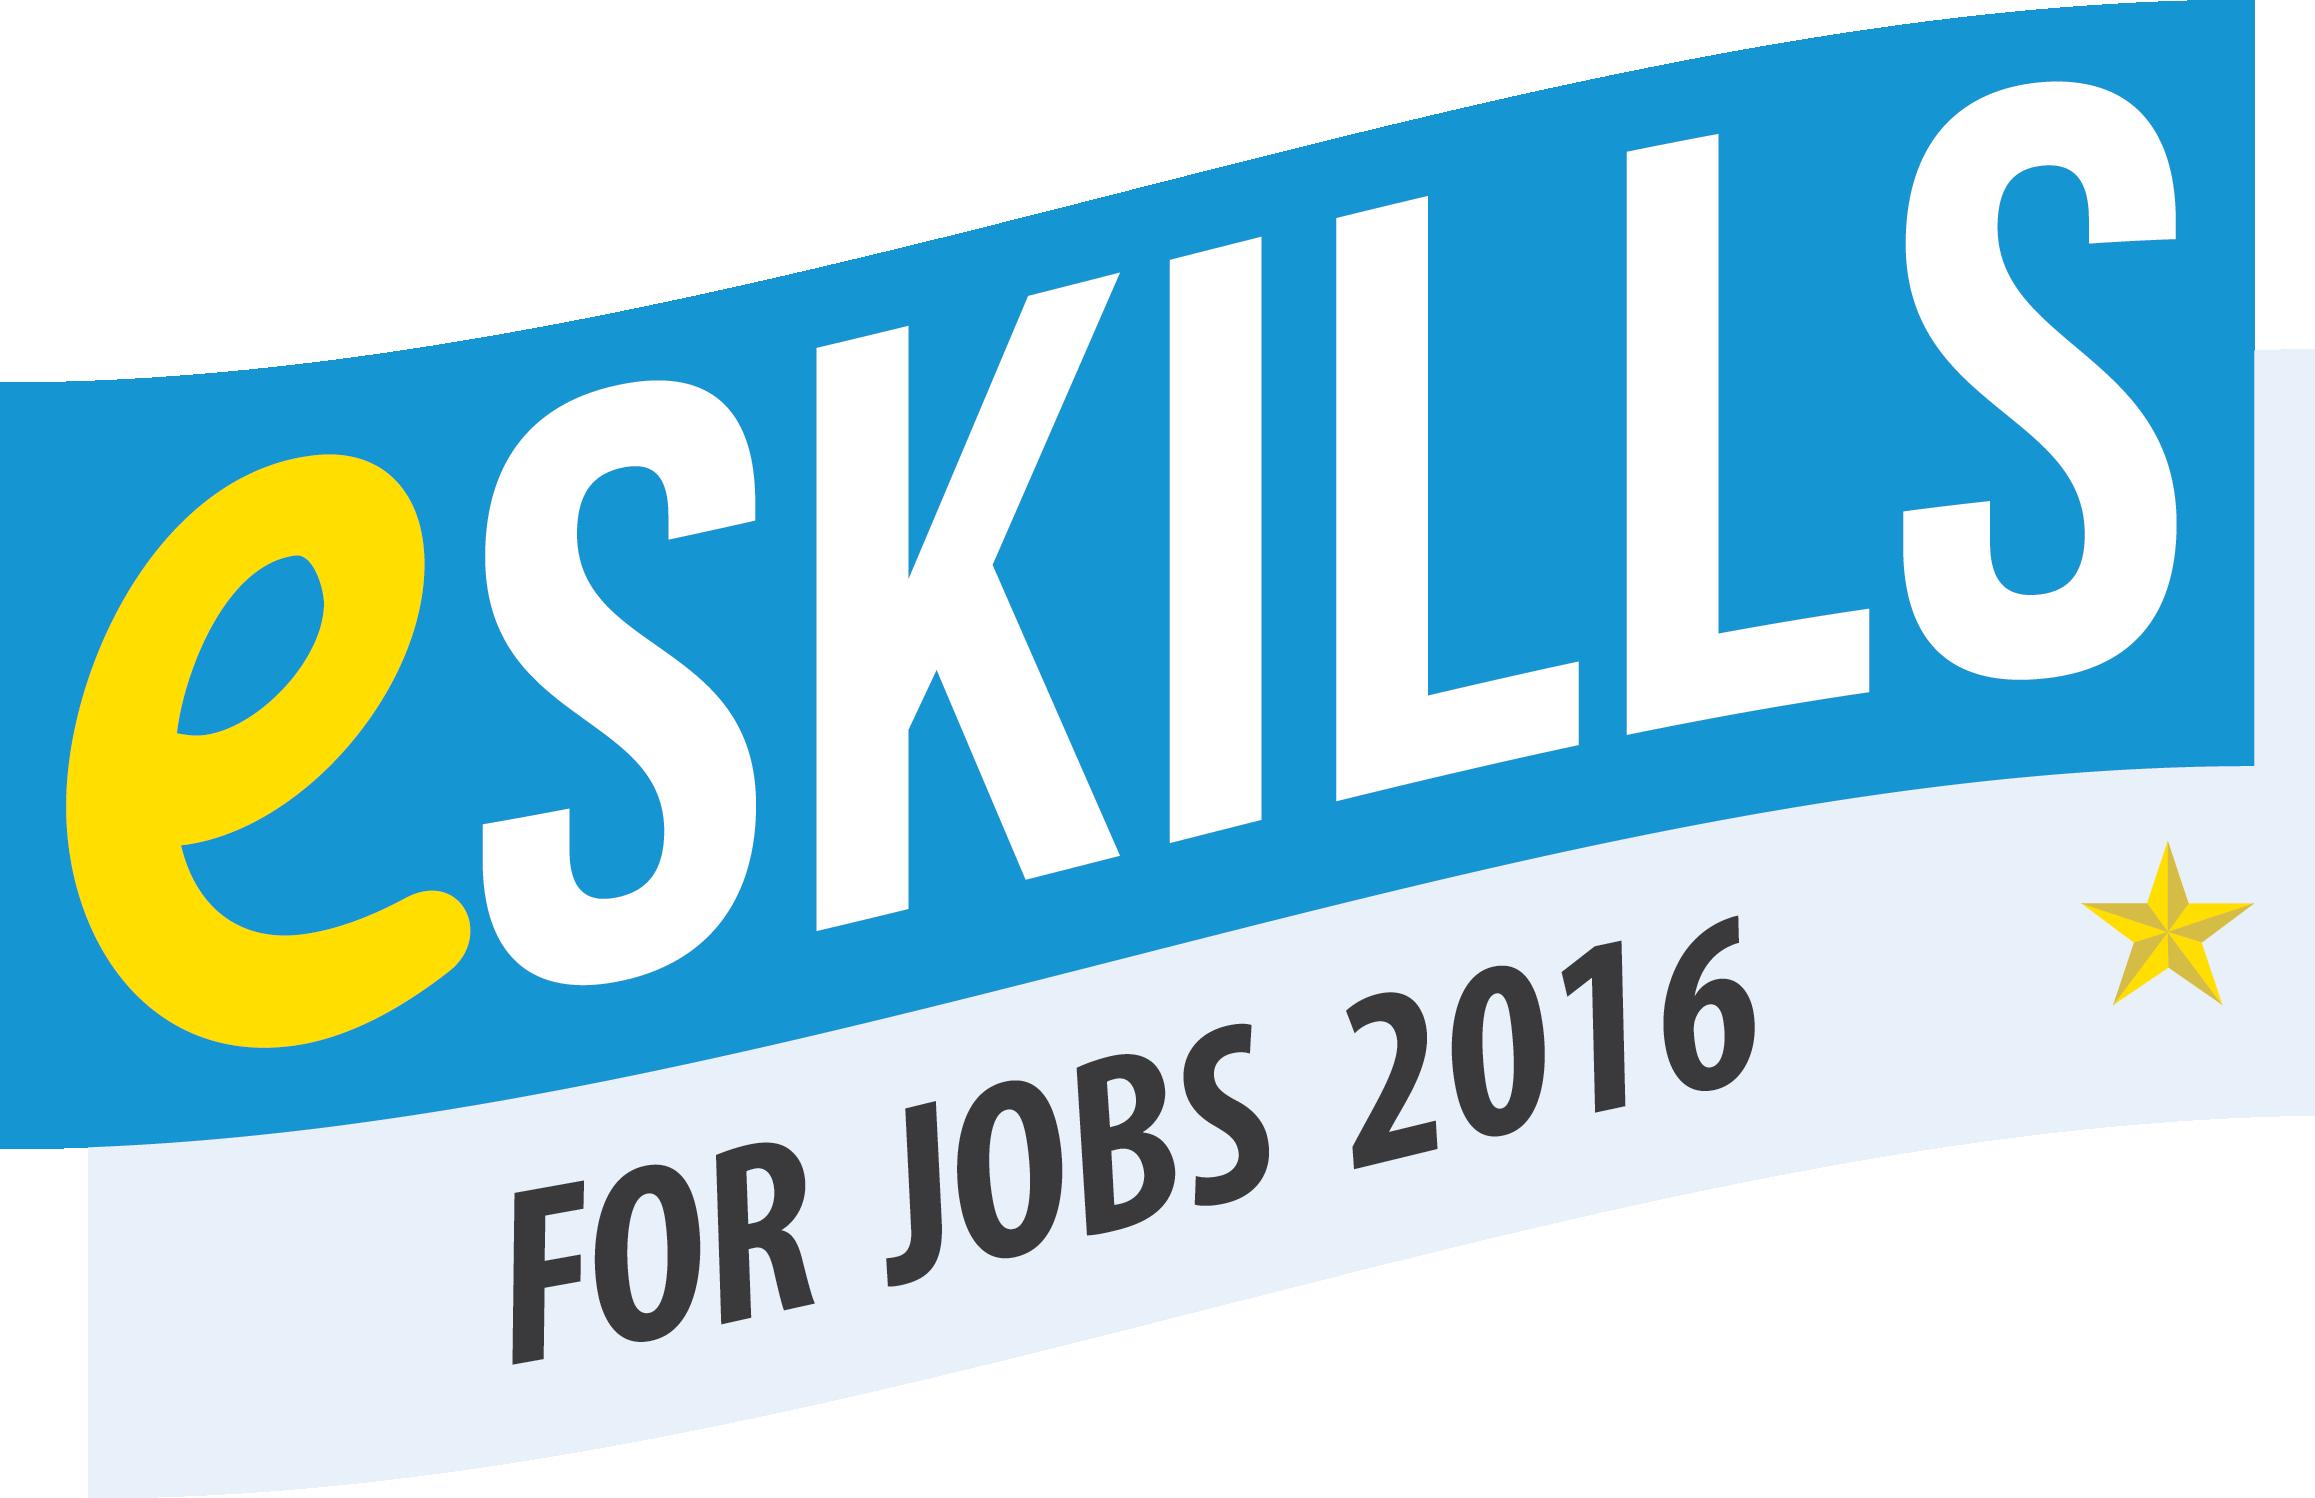 E-skills 2016